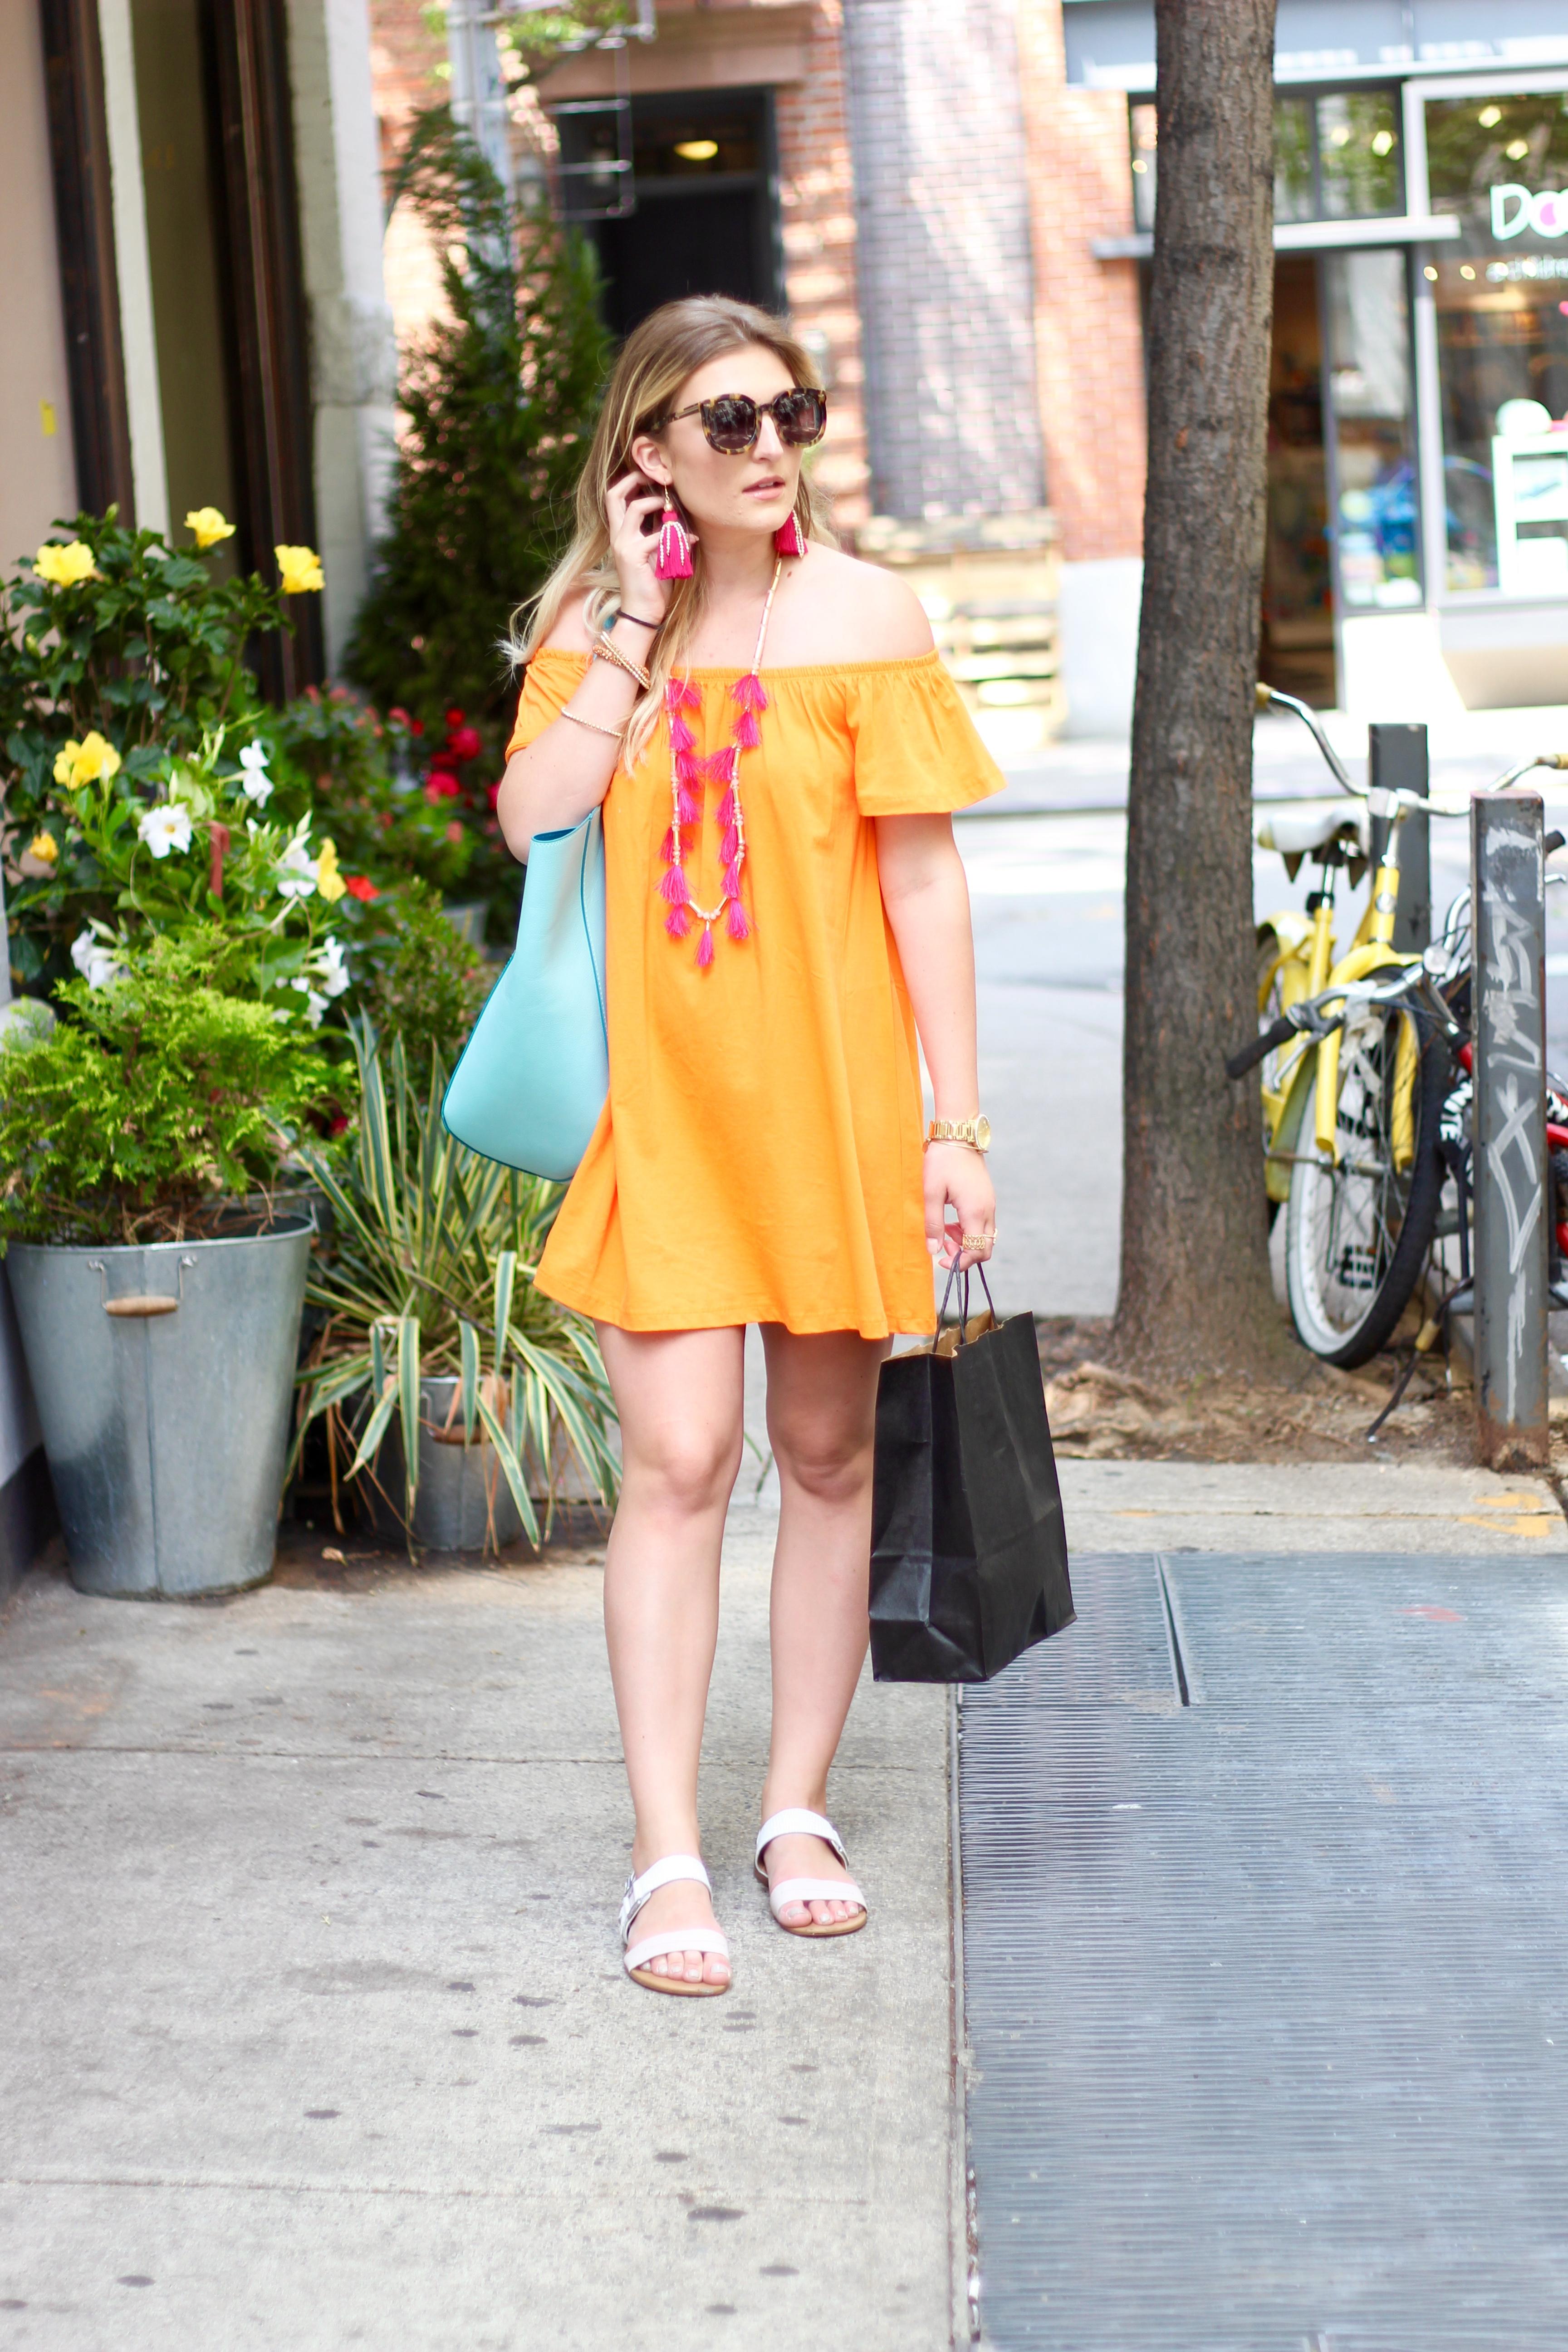 street summer style in soho | Audrey Madison Stowe Blog